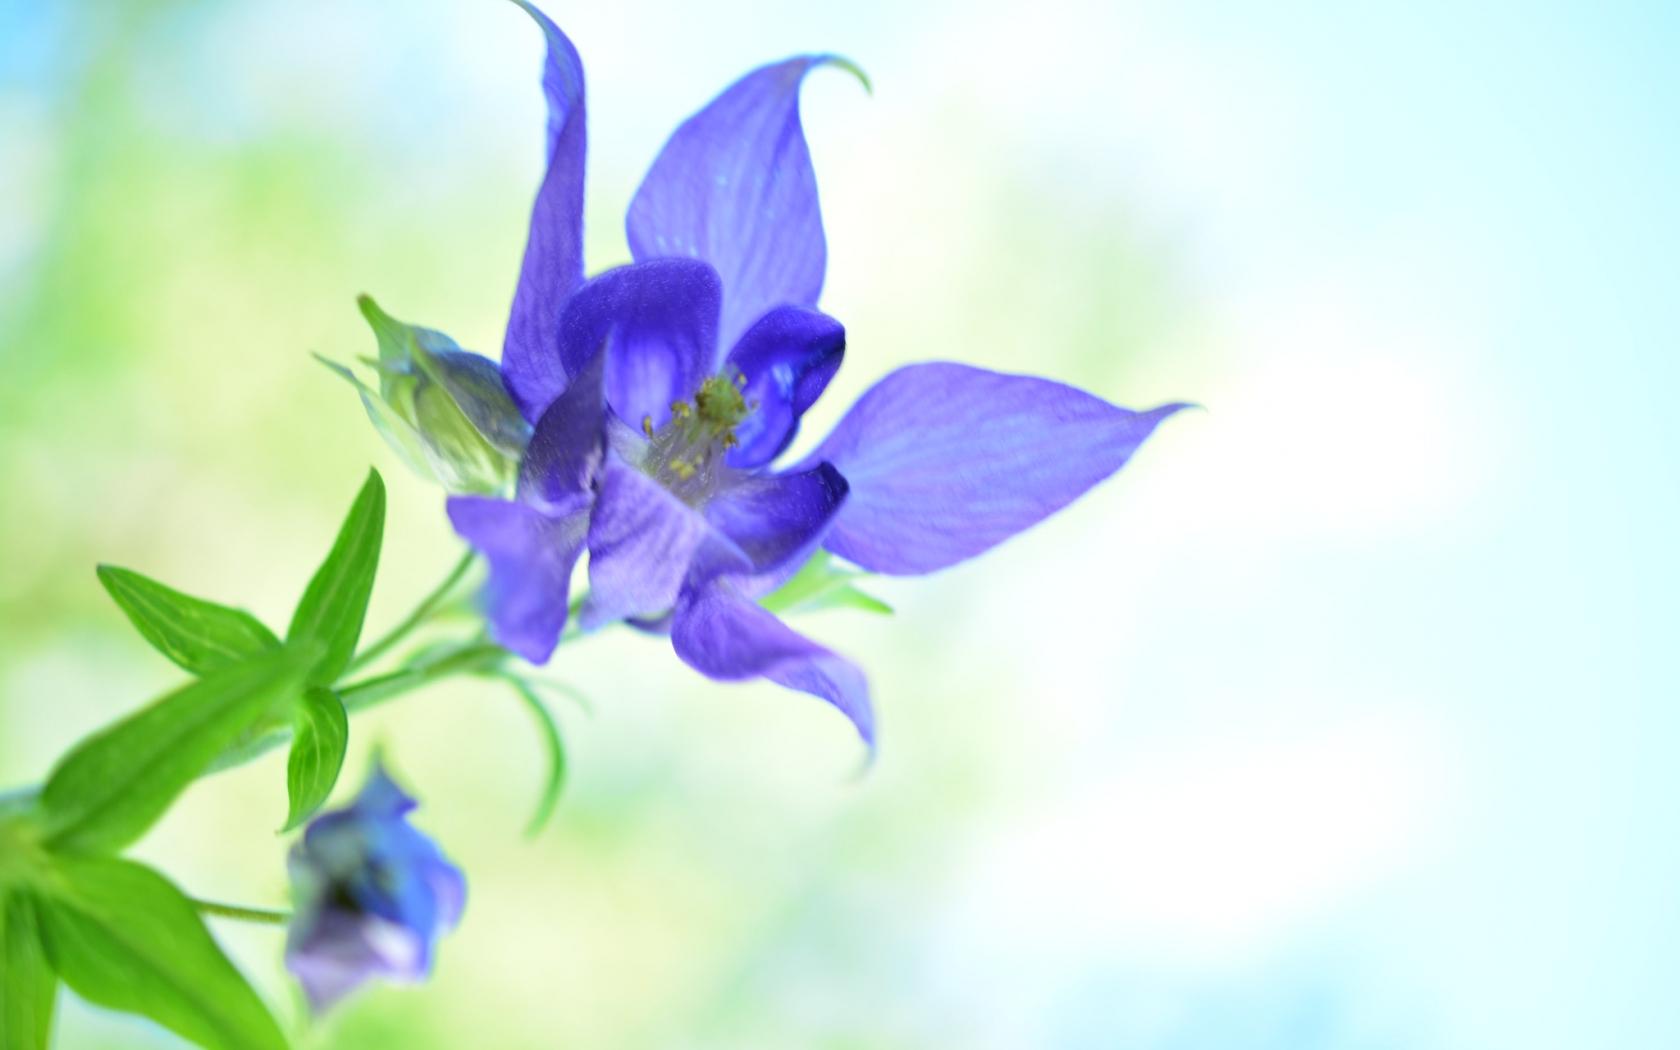 Bella flor azul - 1680x1050